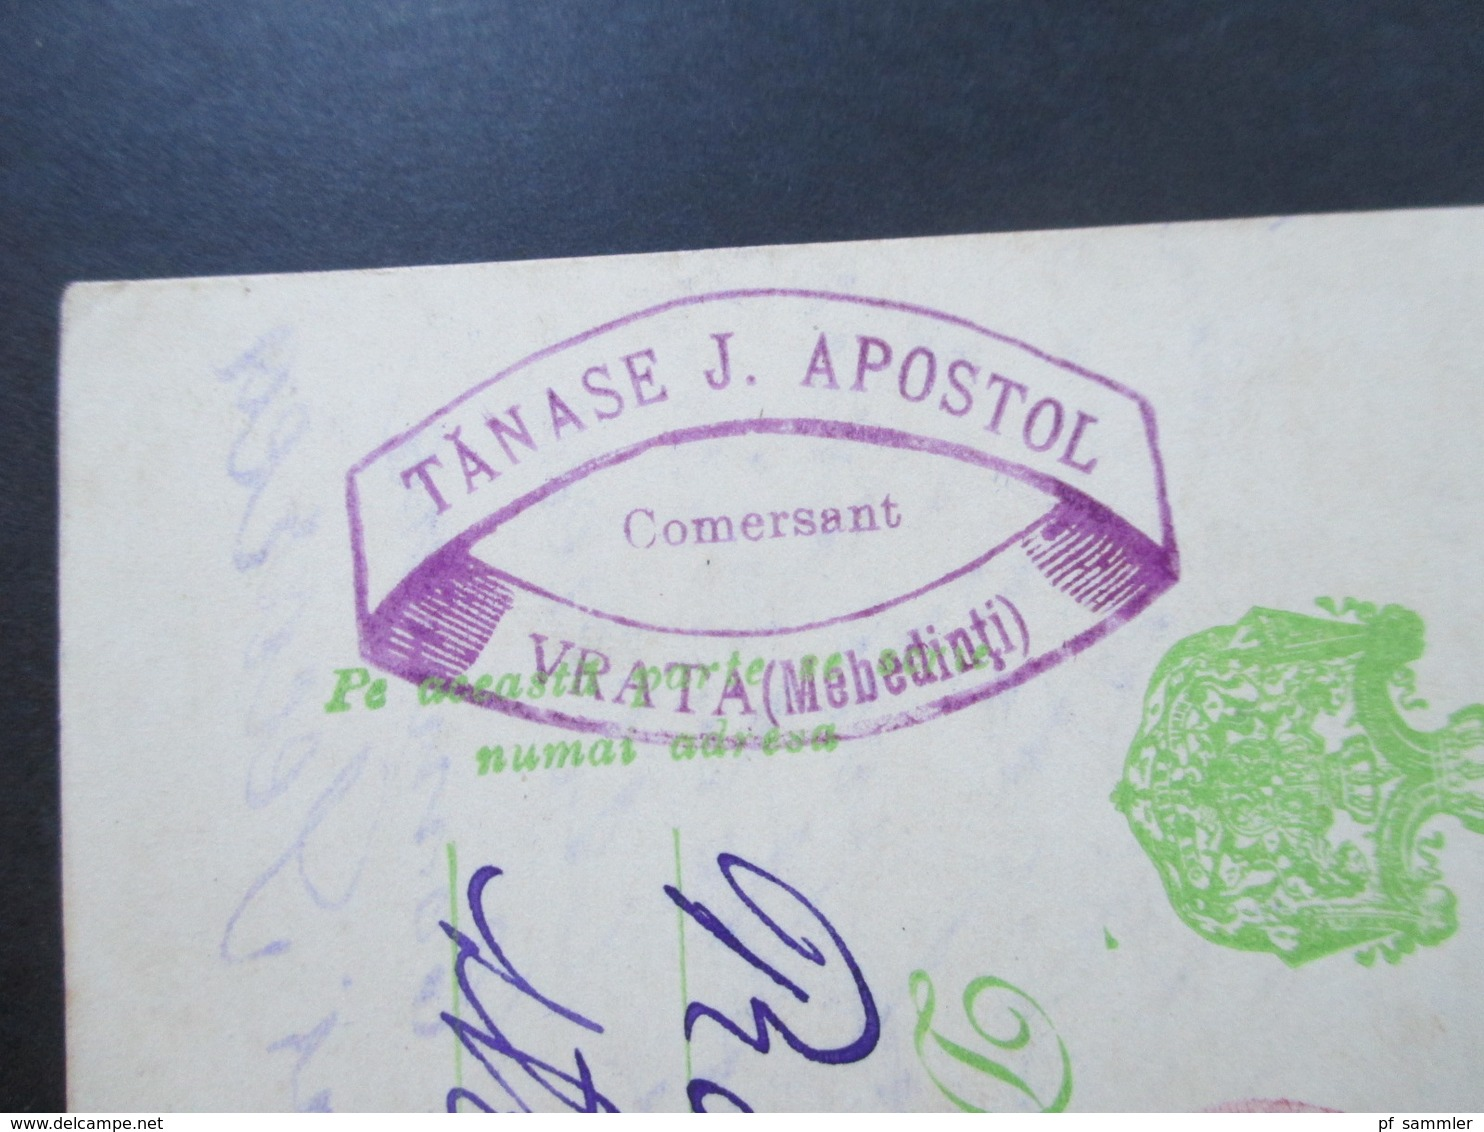 Rumänien 1913 Ganzsache Mit Violettem Stempel!! Tanase J. Apostol Comersent Vrata (Mebedinti) - Covers & Documents